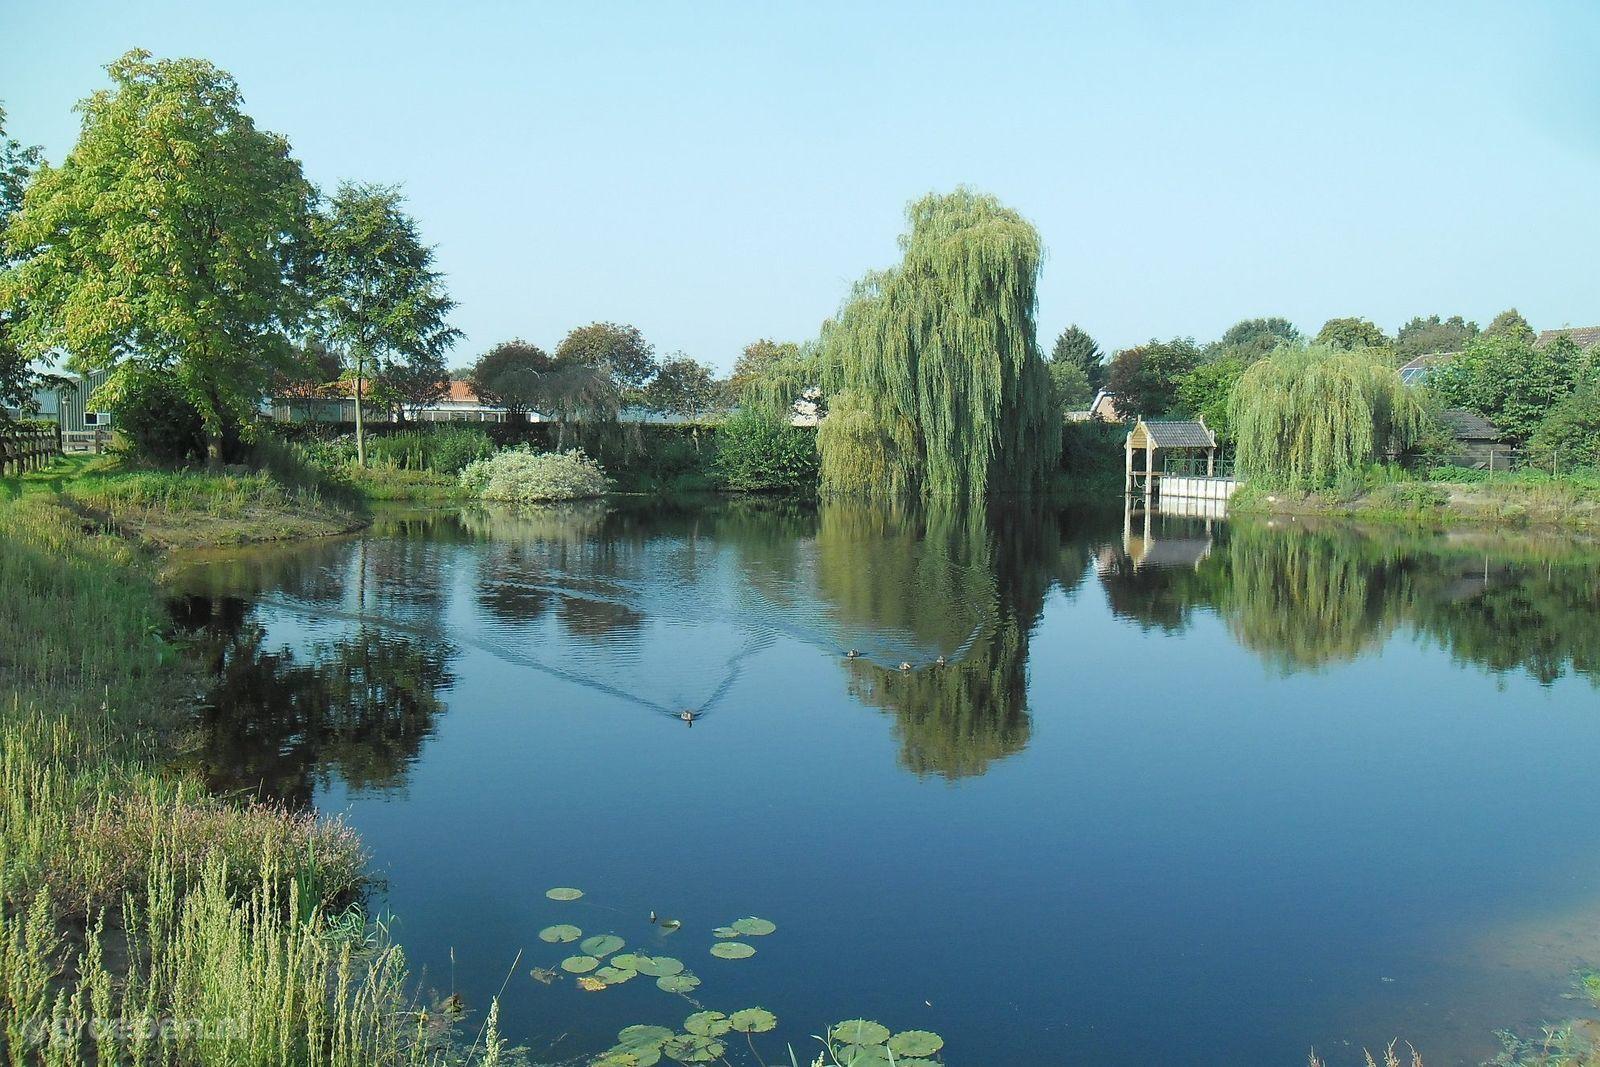 Heeswijk-Dinther